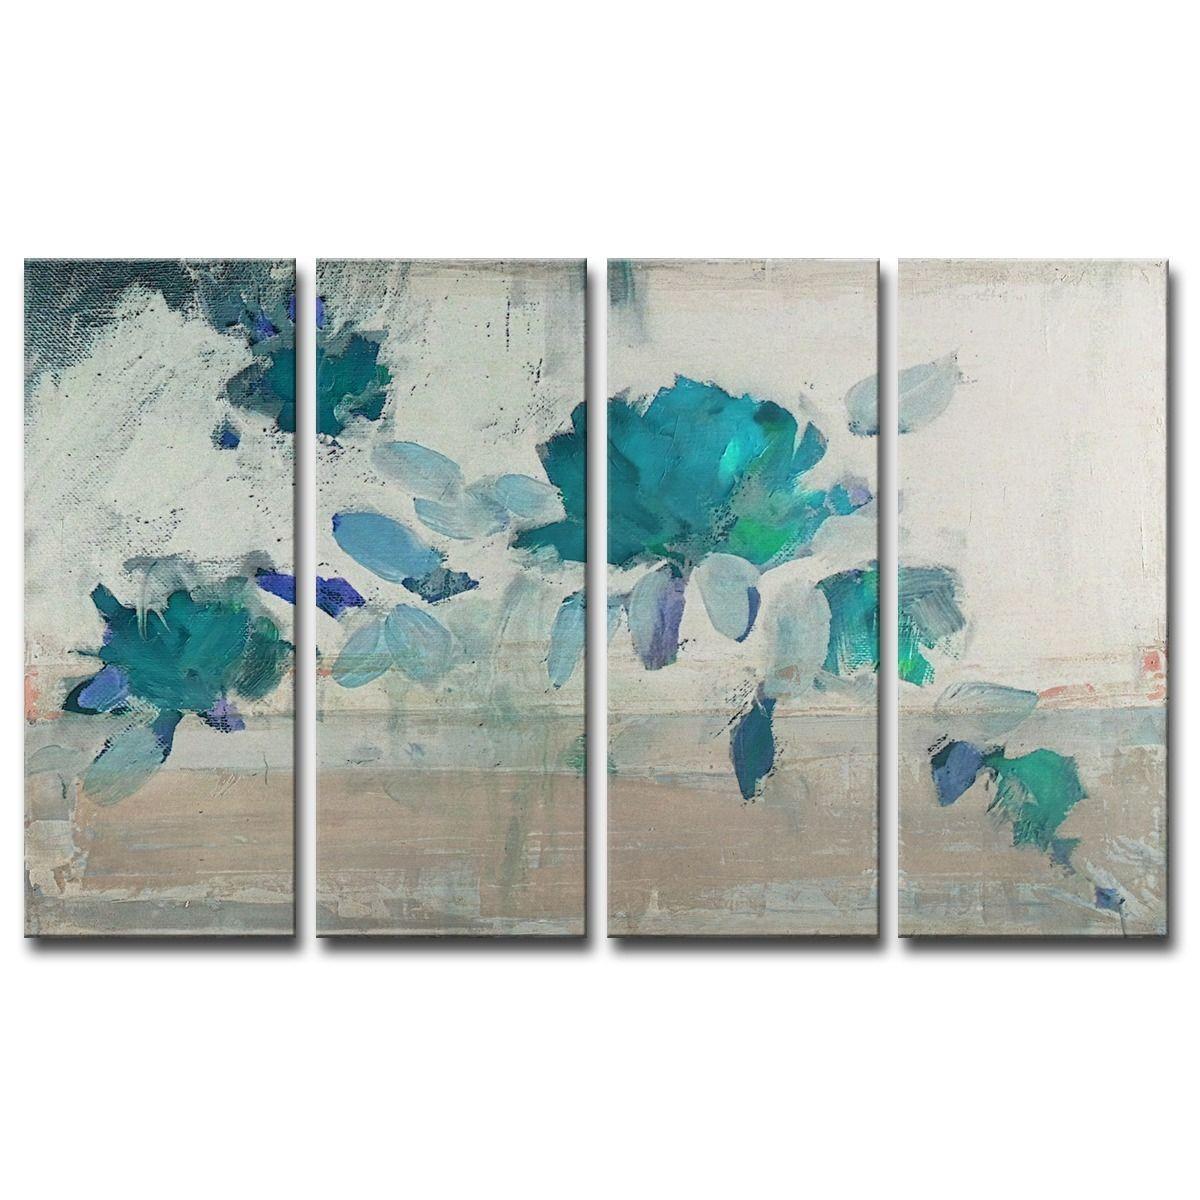 Readyhangart upainted petals ivbu piece wall art set products